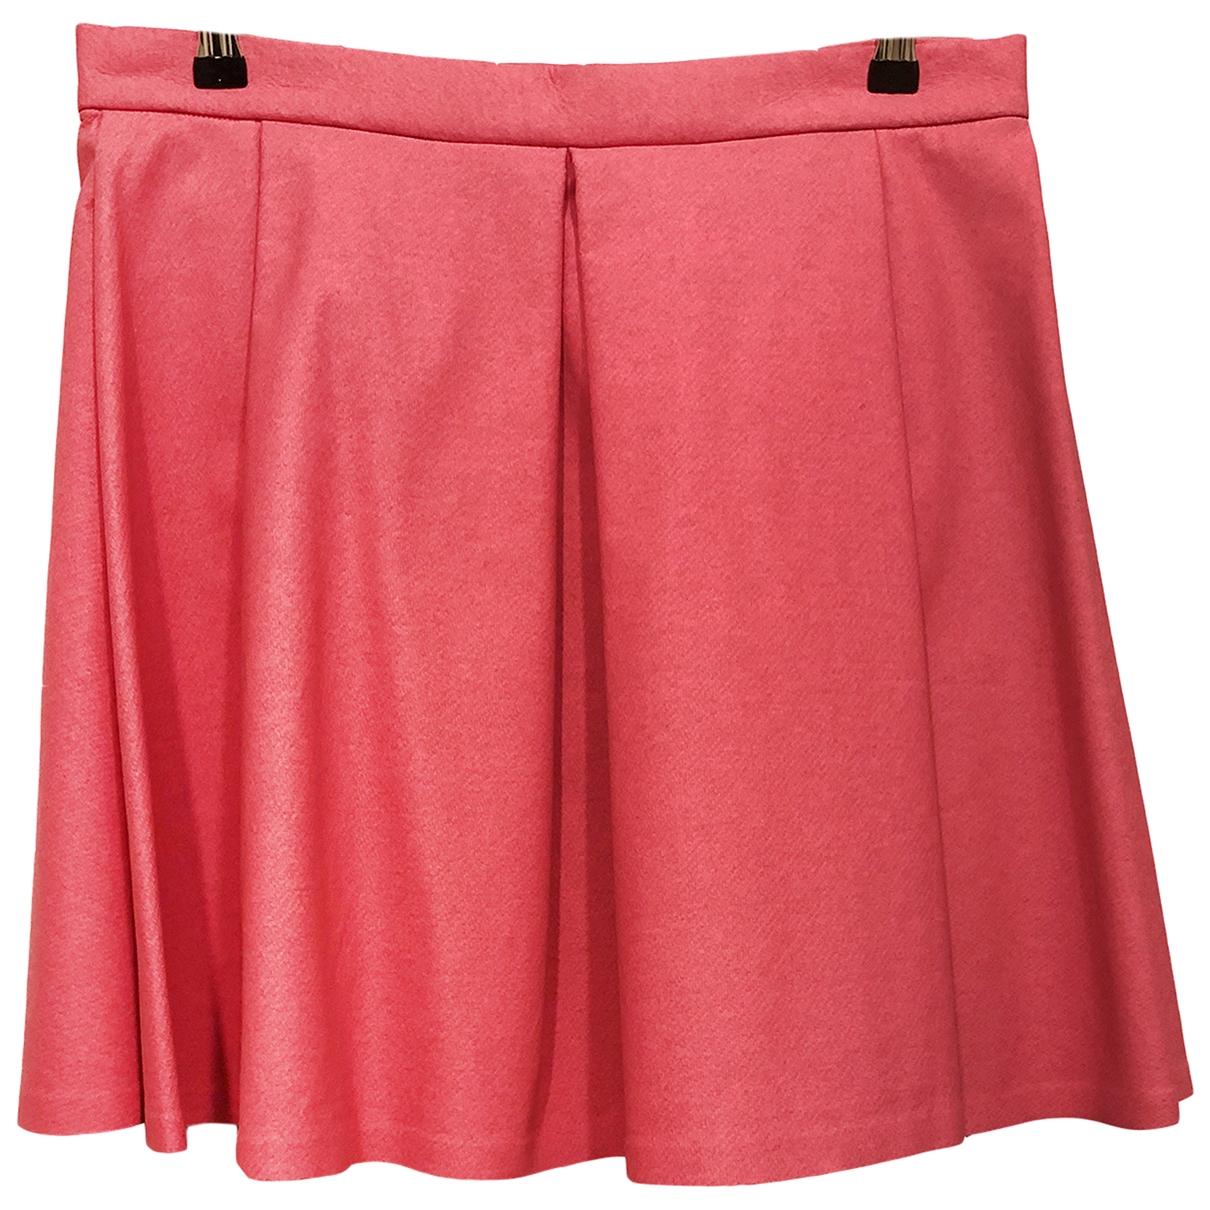 Cos \N Pink Cotton skirt for Women M International